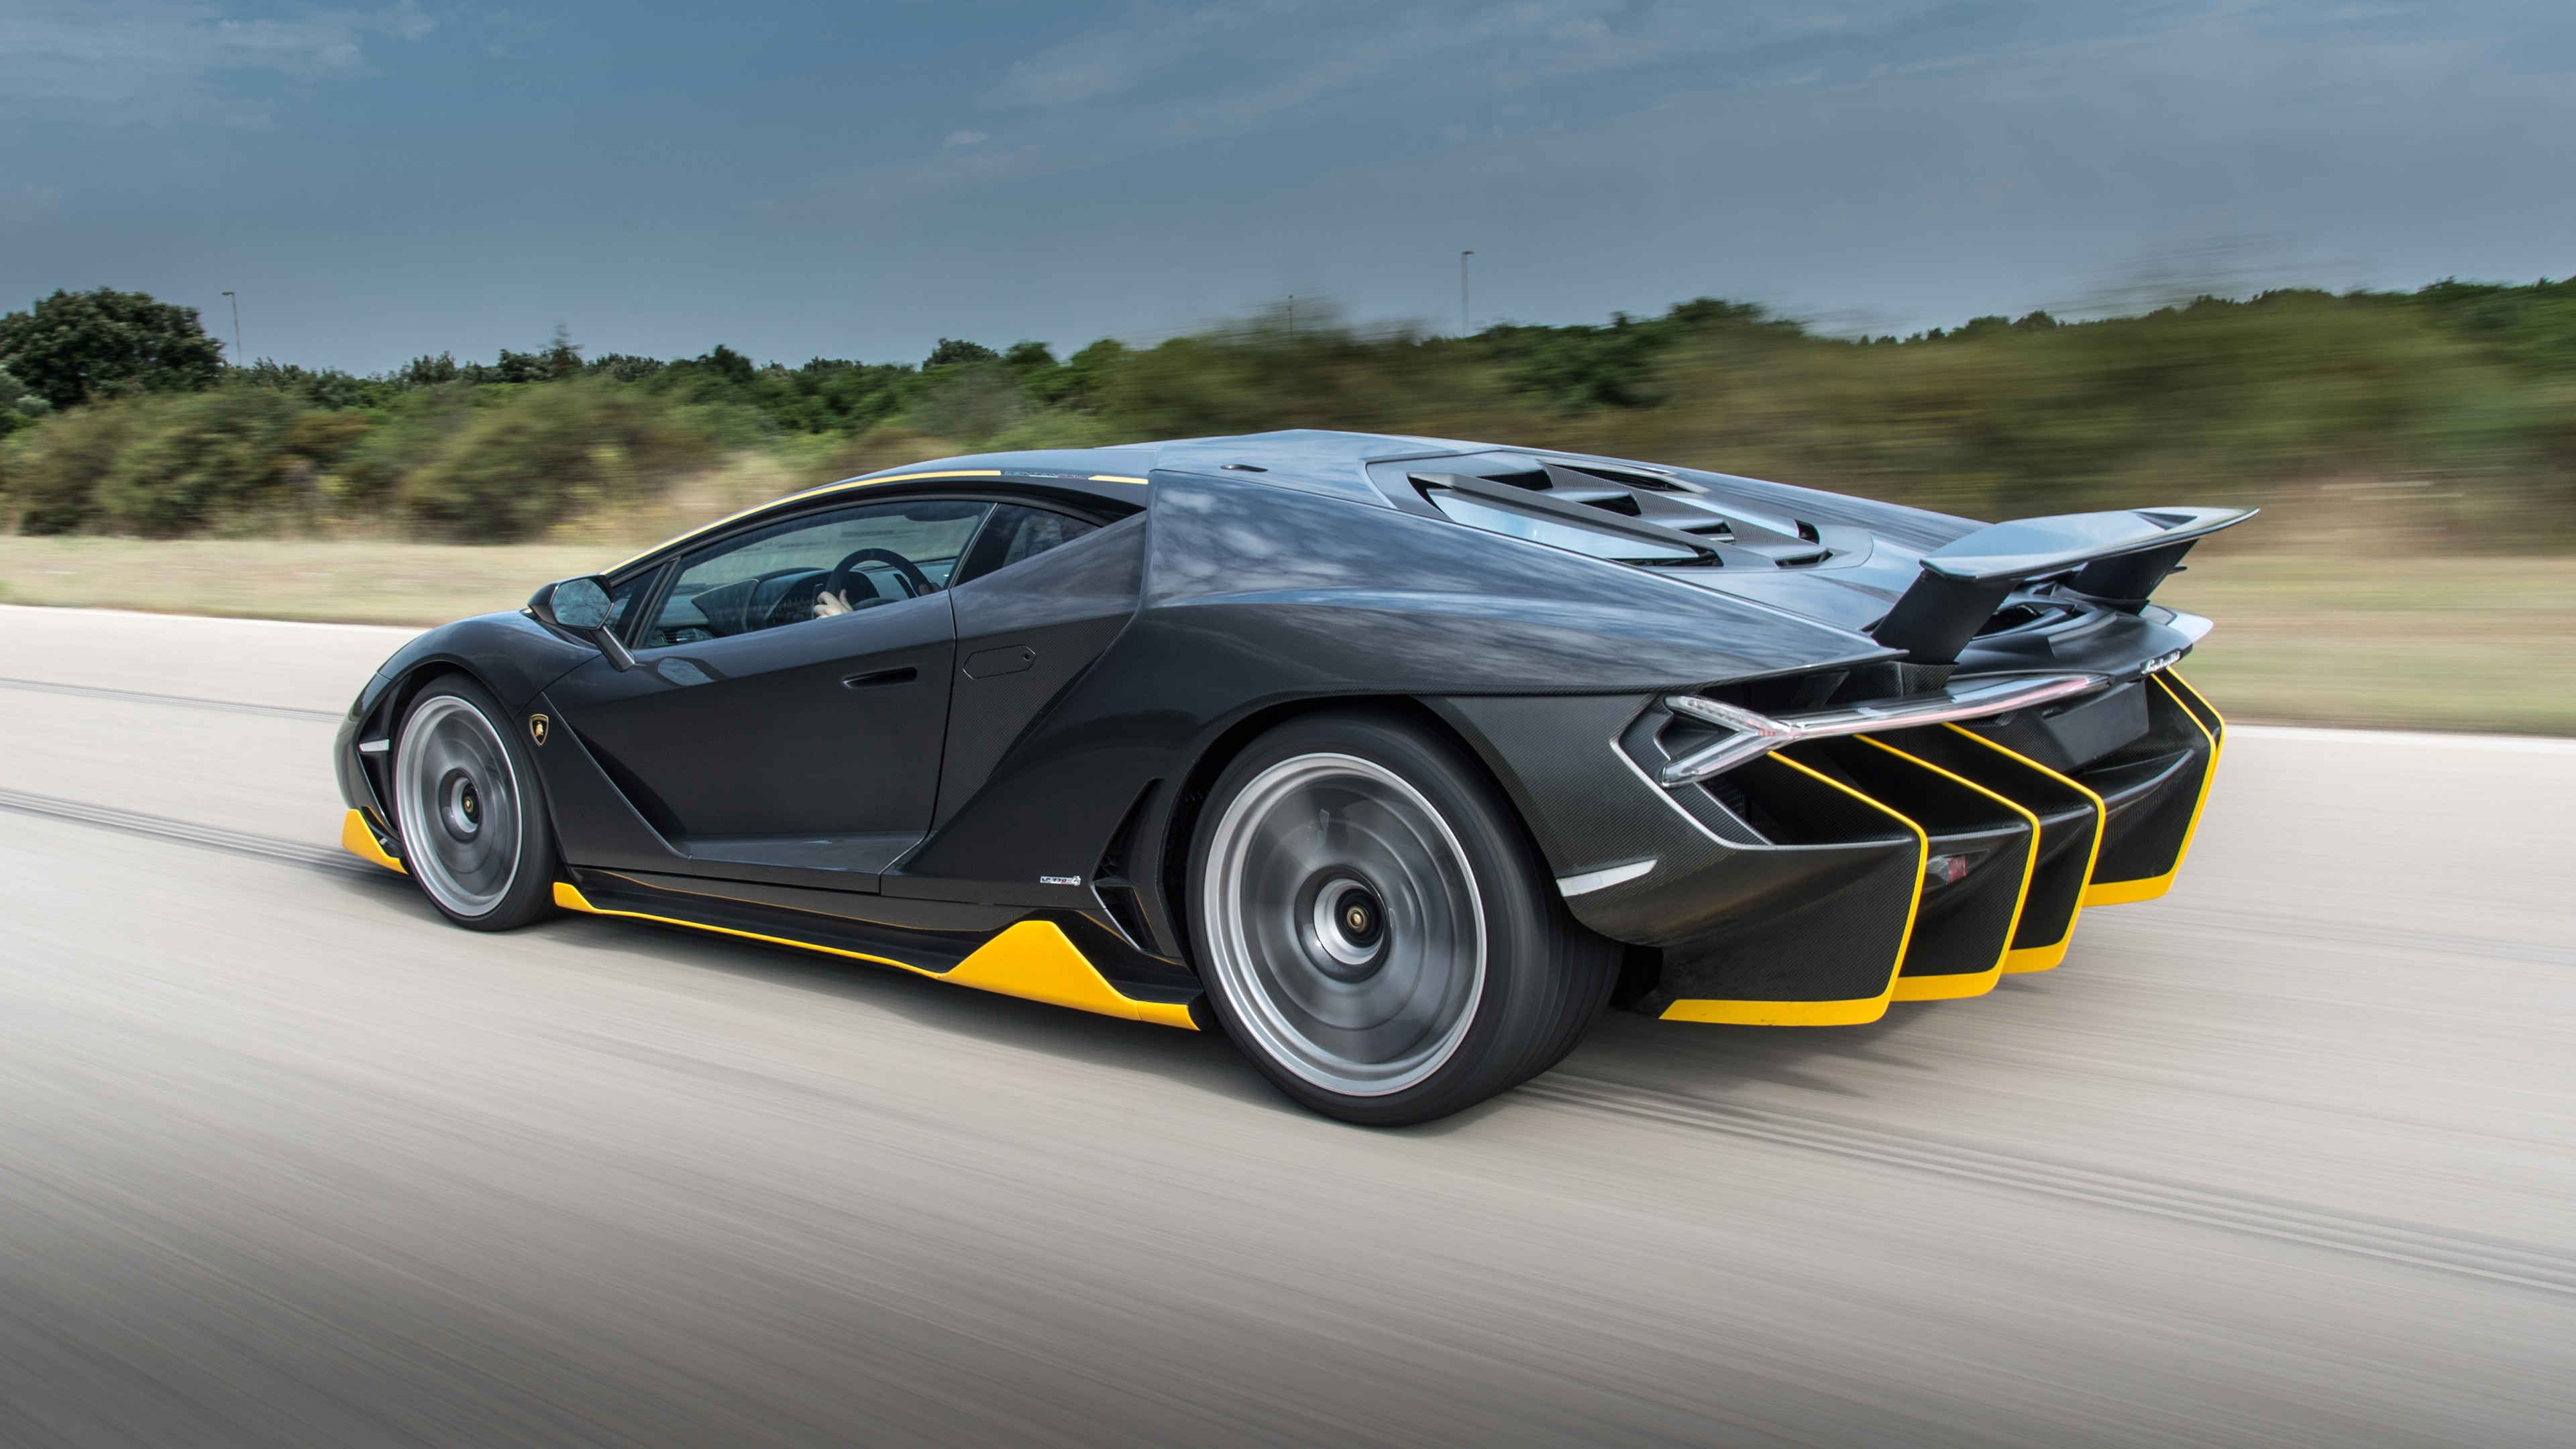 lamborghini centenario side view speed 4k 1538937117 - lamborghini, centenario, side view, speed 4k - side view, Lamborghini, Centenario